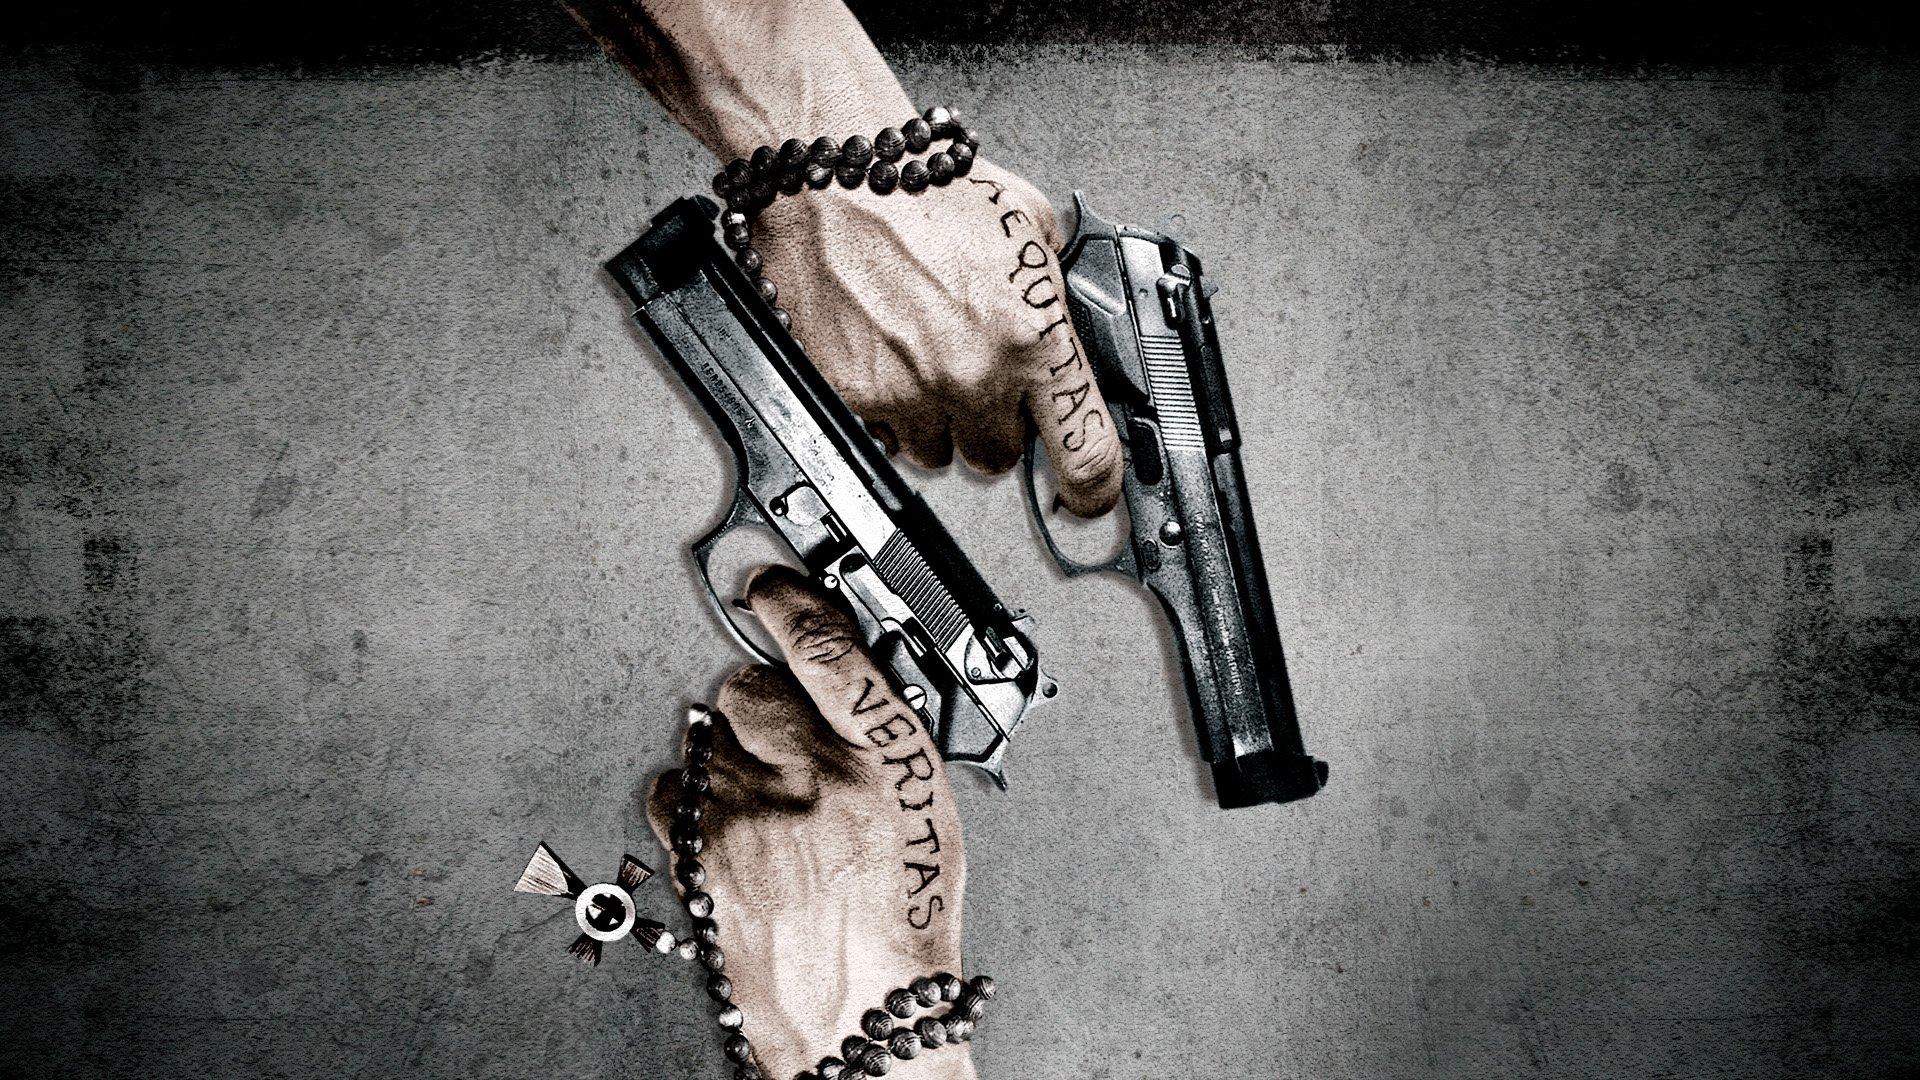 BOONDOCK SAINTS action crime thriller weapon gun pistol wallpaper 1920x1080